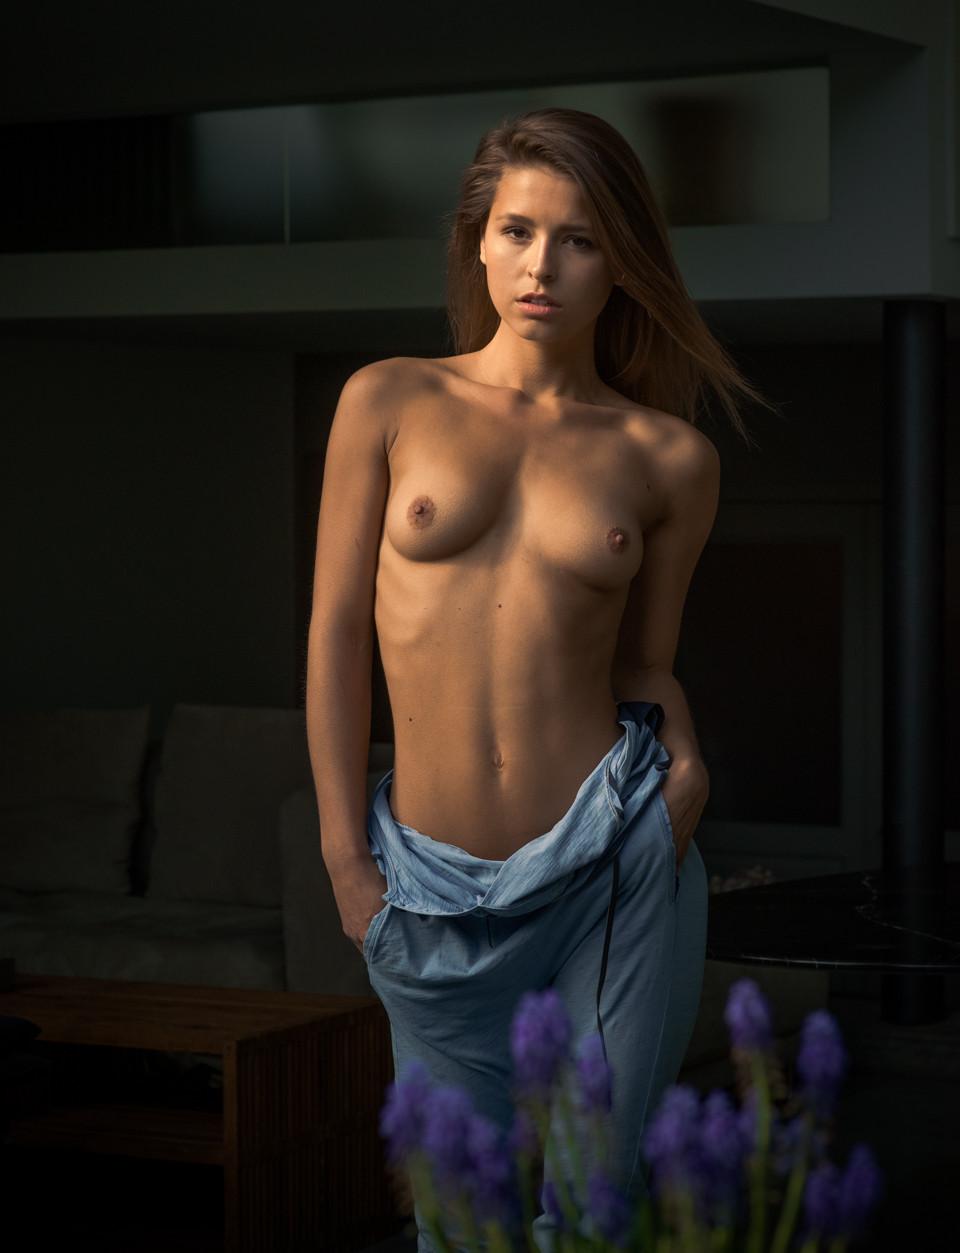 Marissa merill nude #15